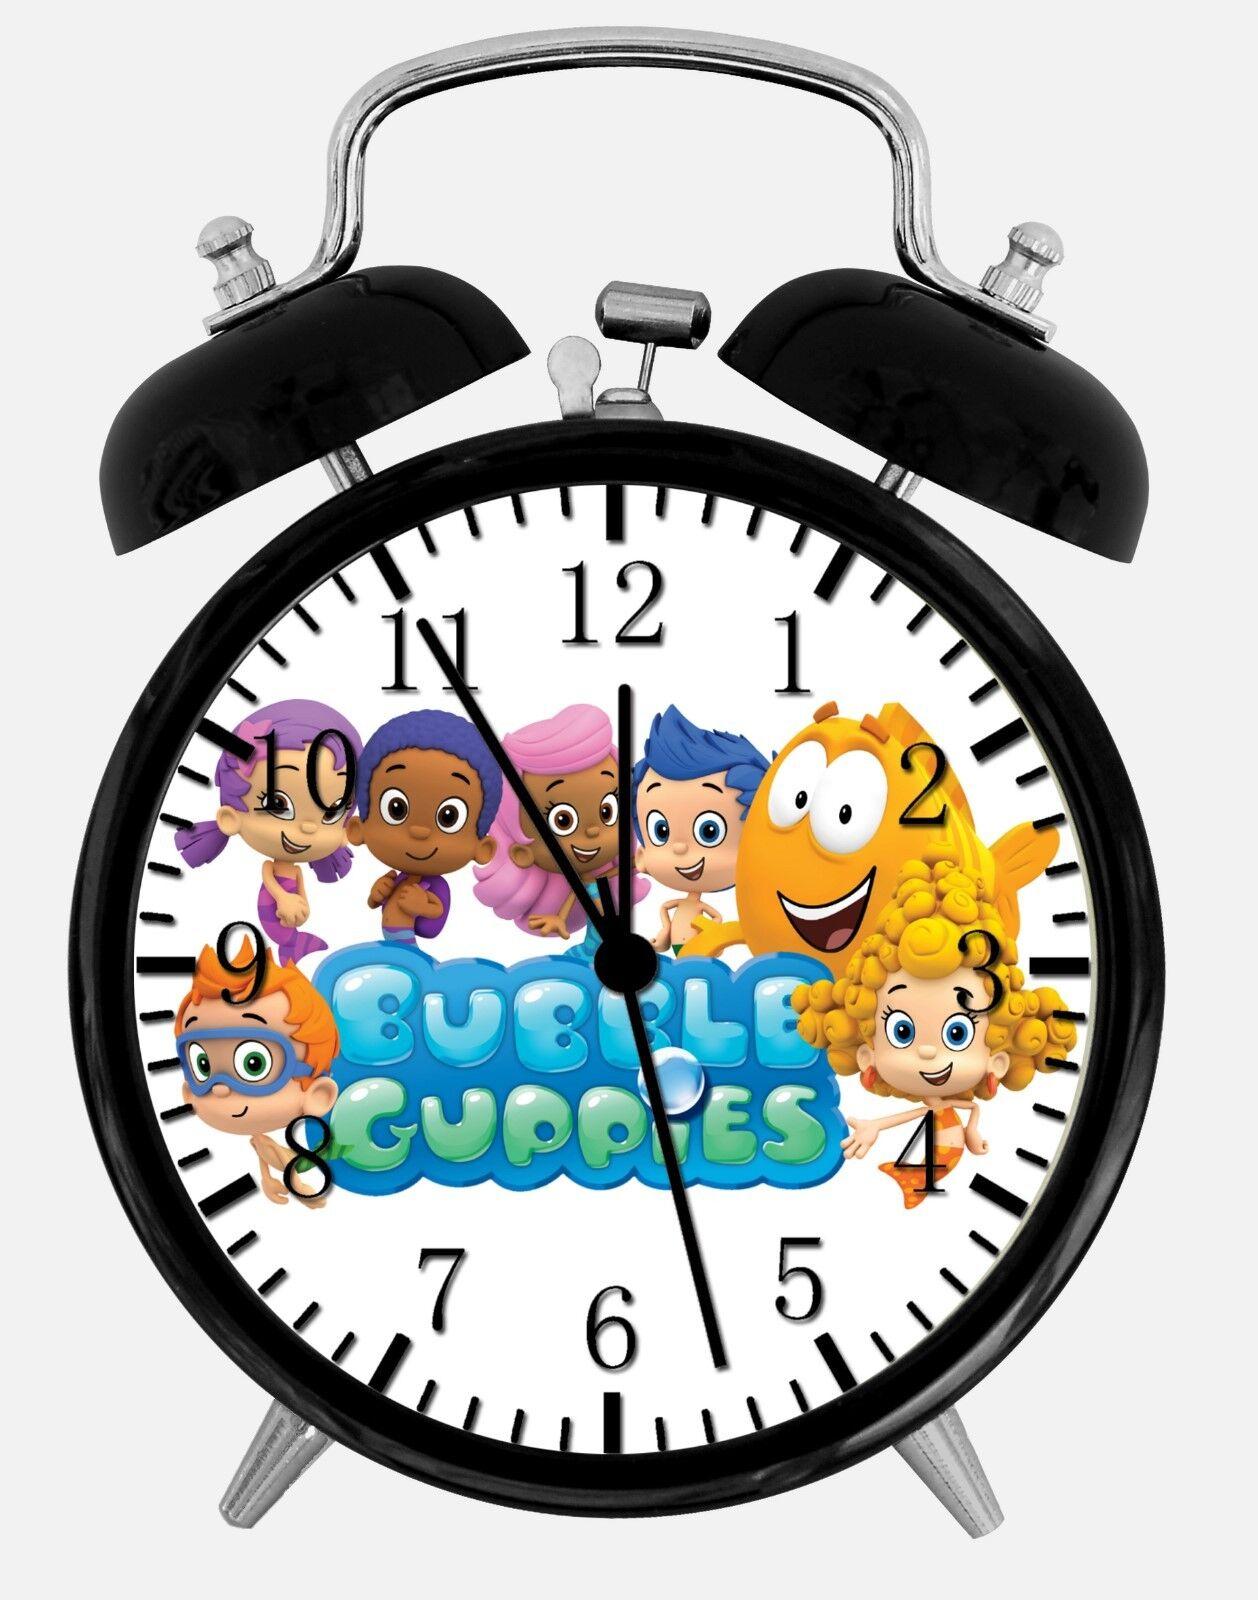 "Bubble Guppies Alarm Desk Clock 3.75"" Home or Office Decor E299 Nice For Gift"